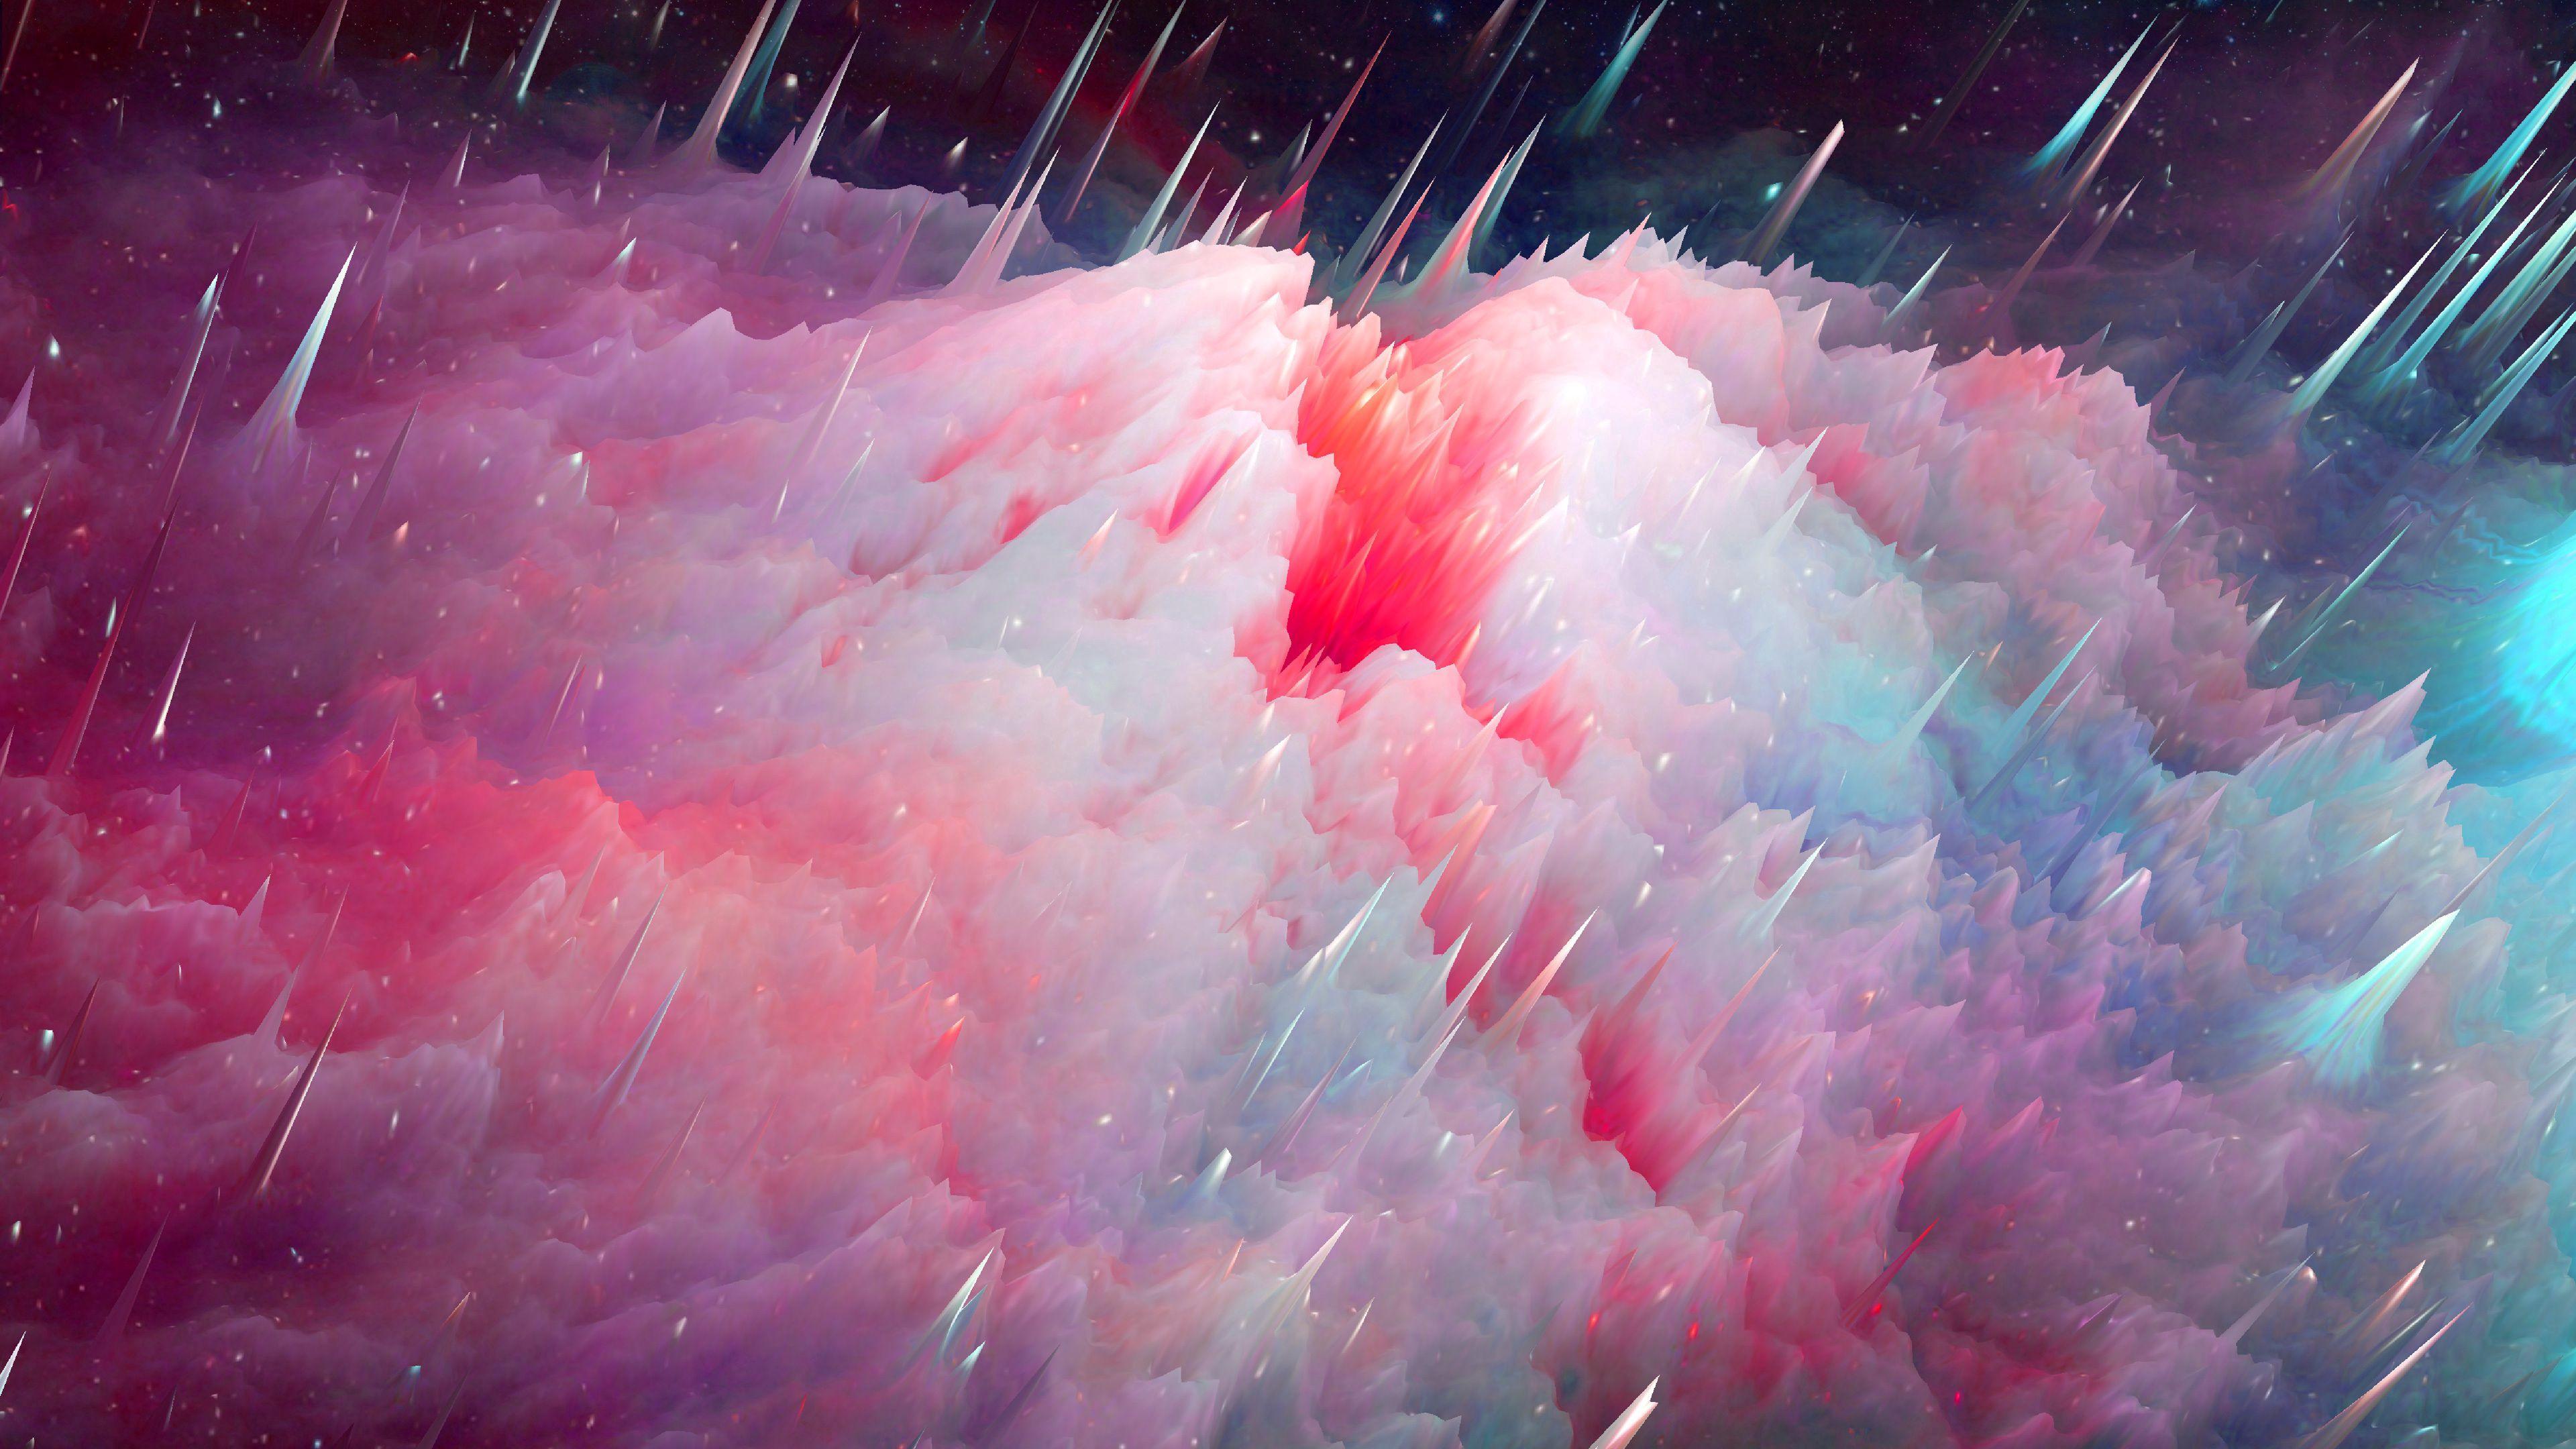 3840x2160 Wallpaper space, art, nebula, universe